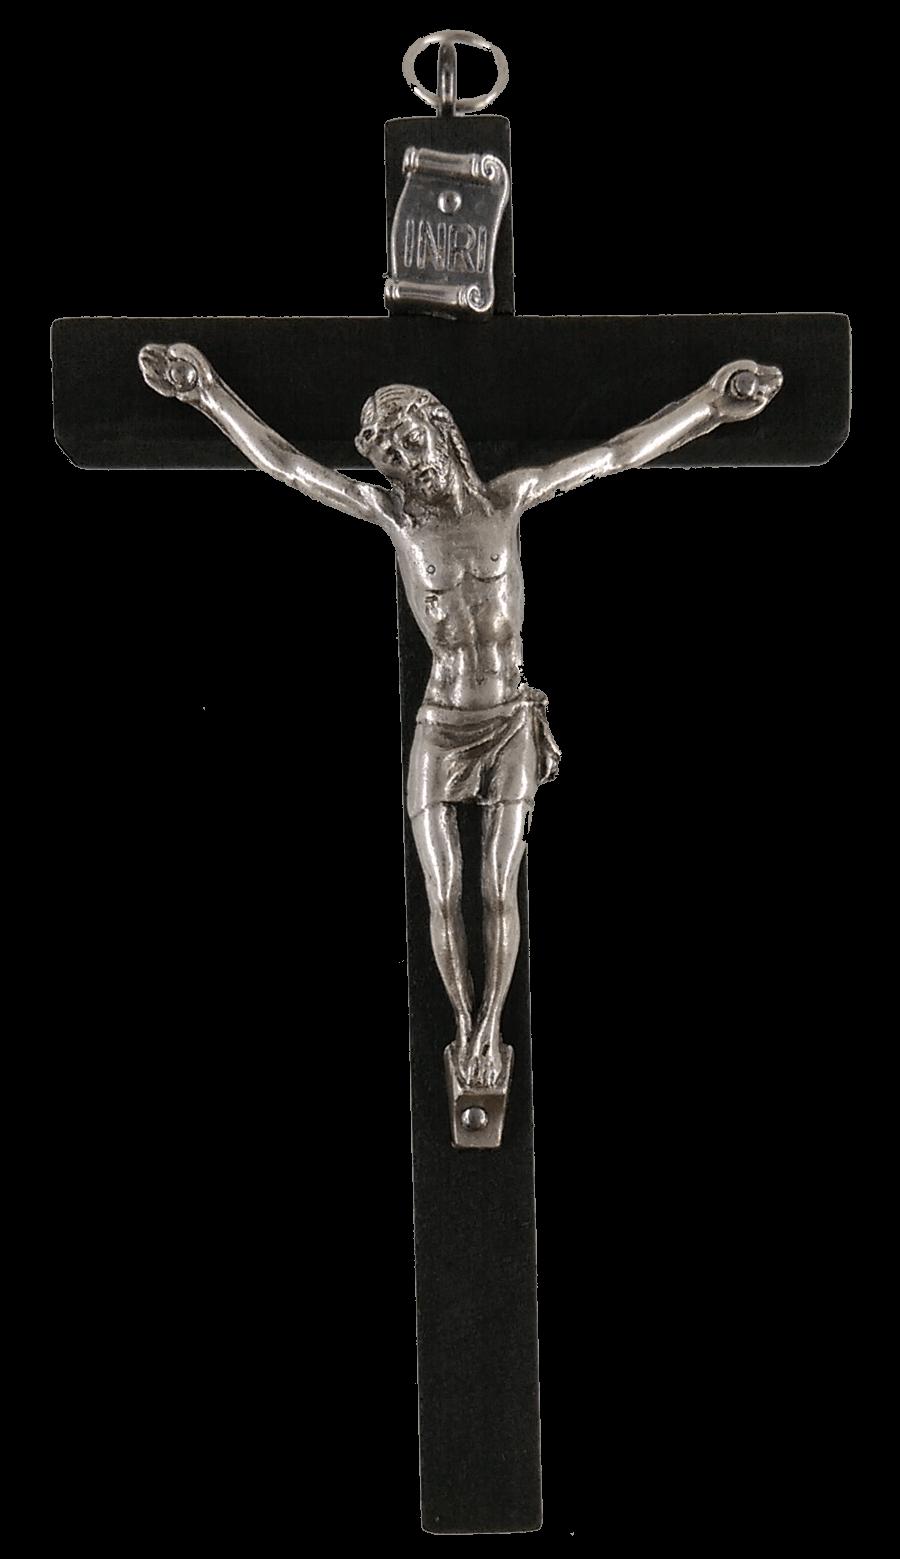 Crucifix clipart contemporary cross. Pin by allison scruggs